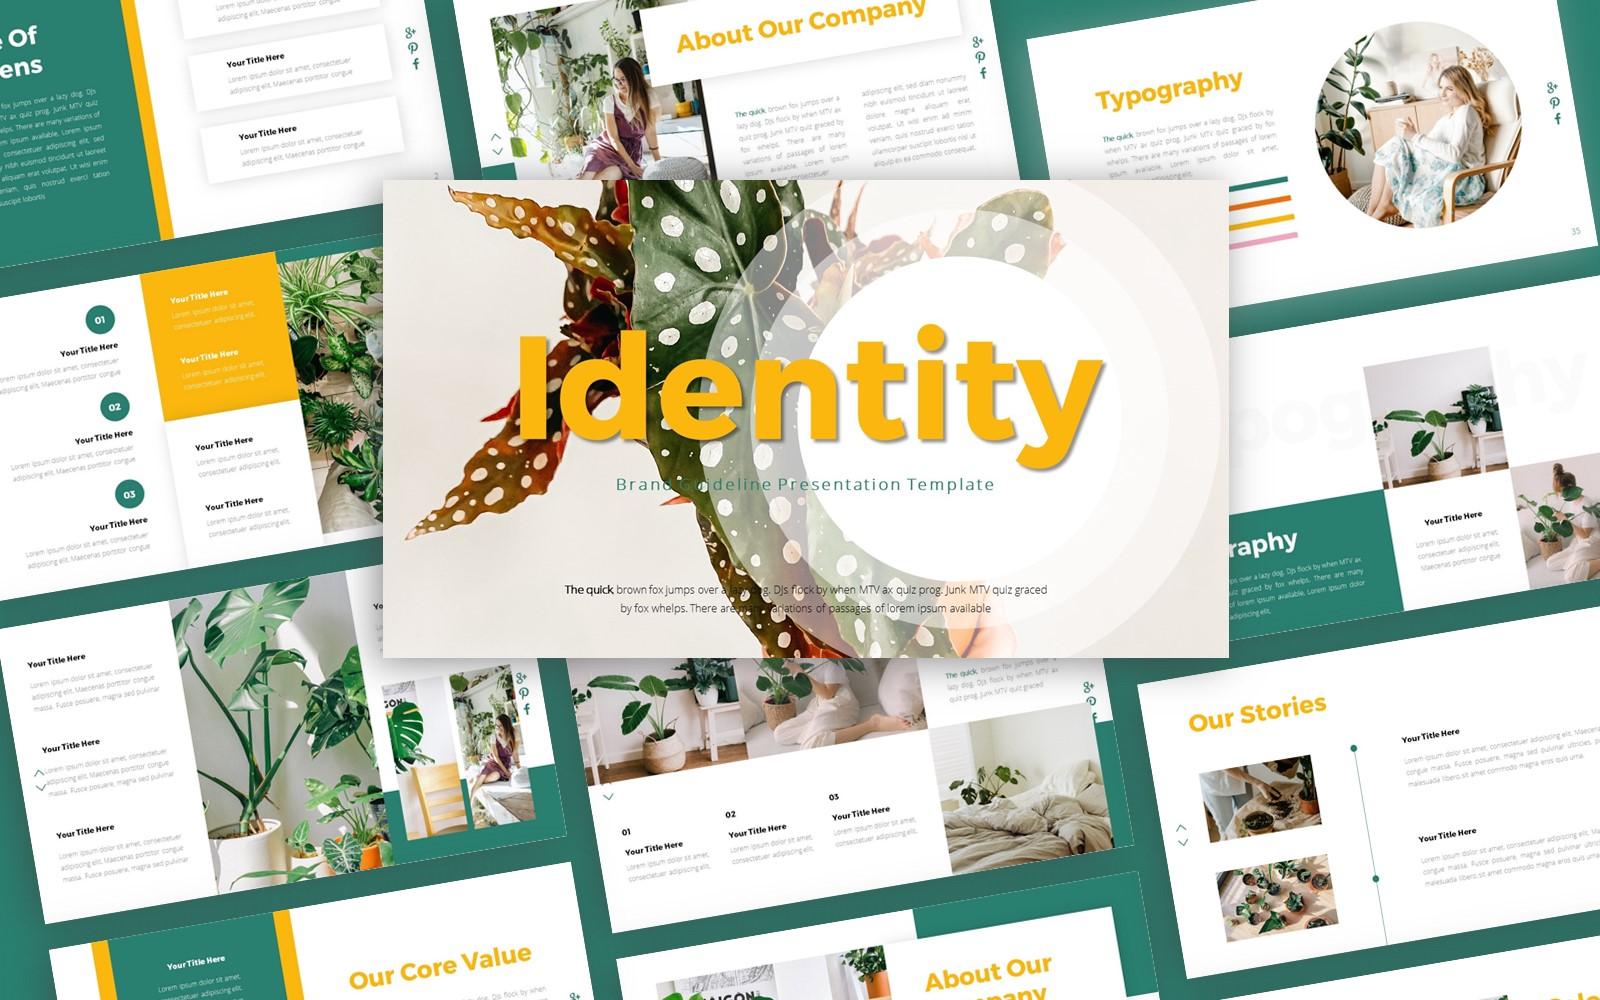 Identity Brand Guideline Presentation PowerPoint Template